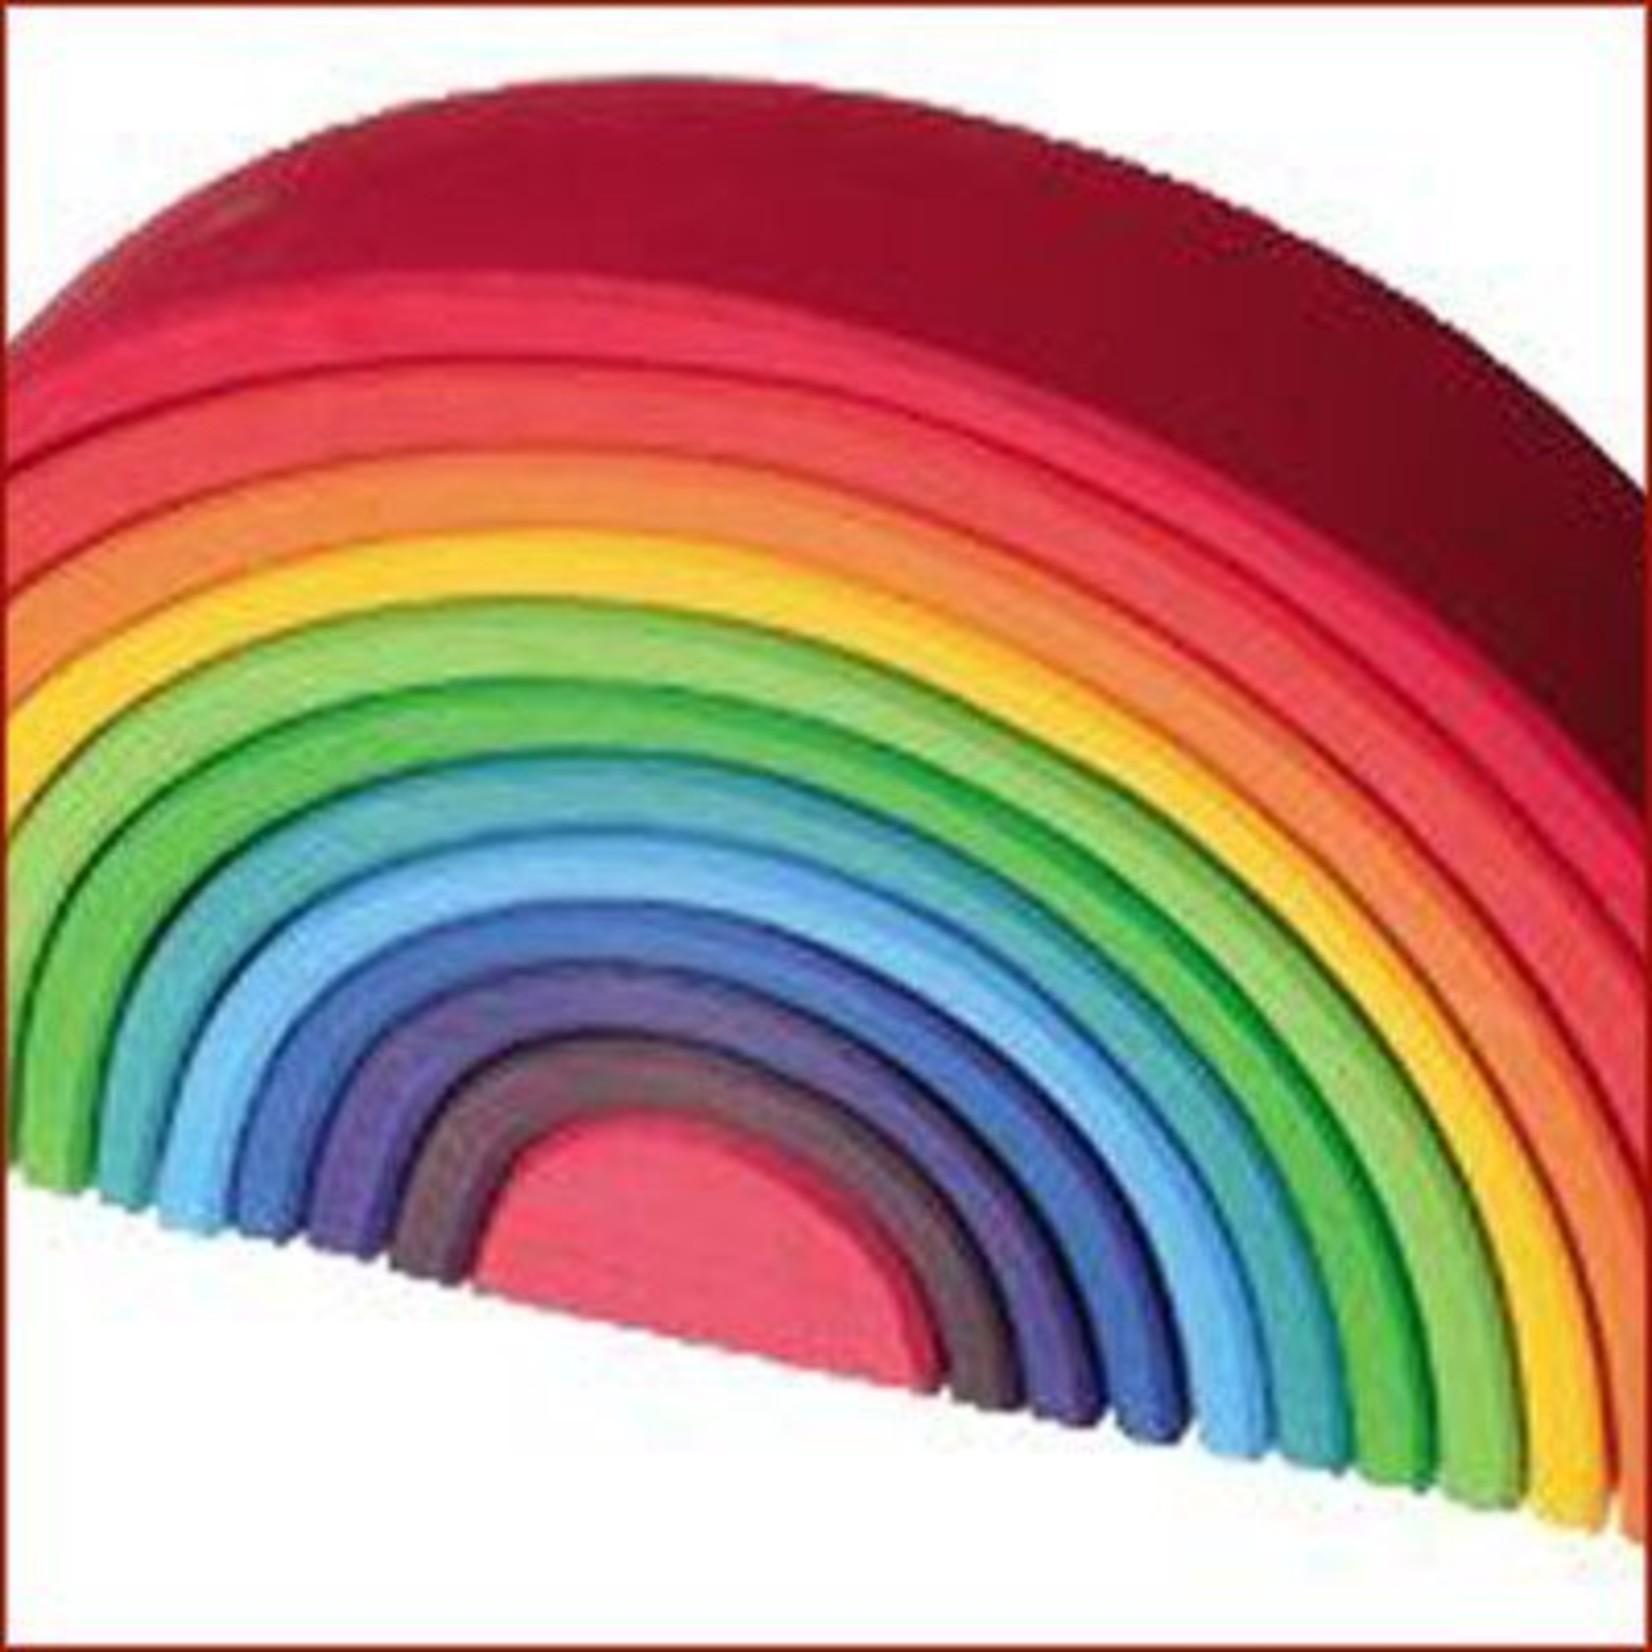 Grimm's Grote Regenboog 12-delig